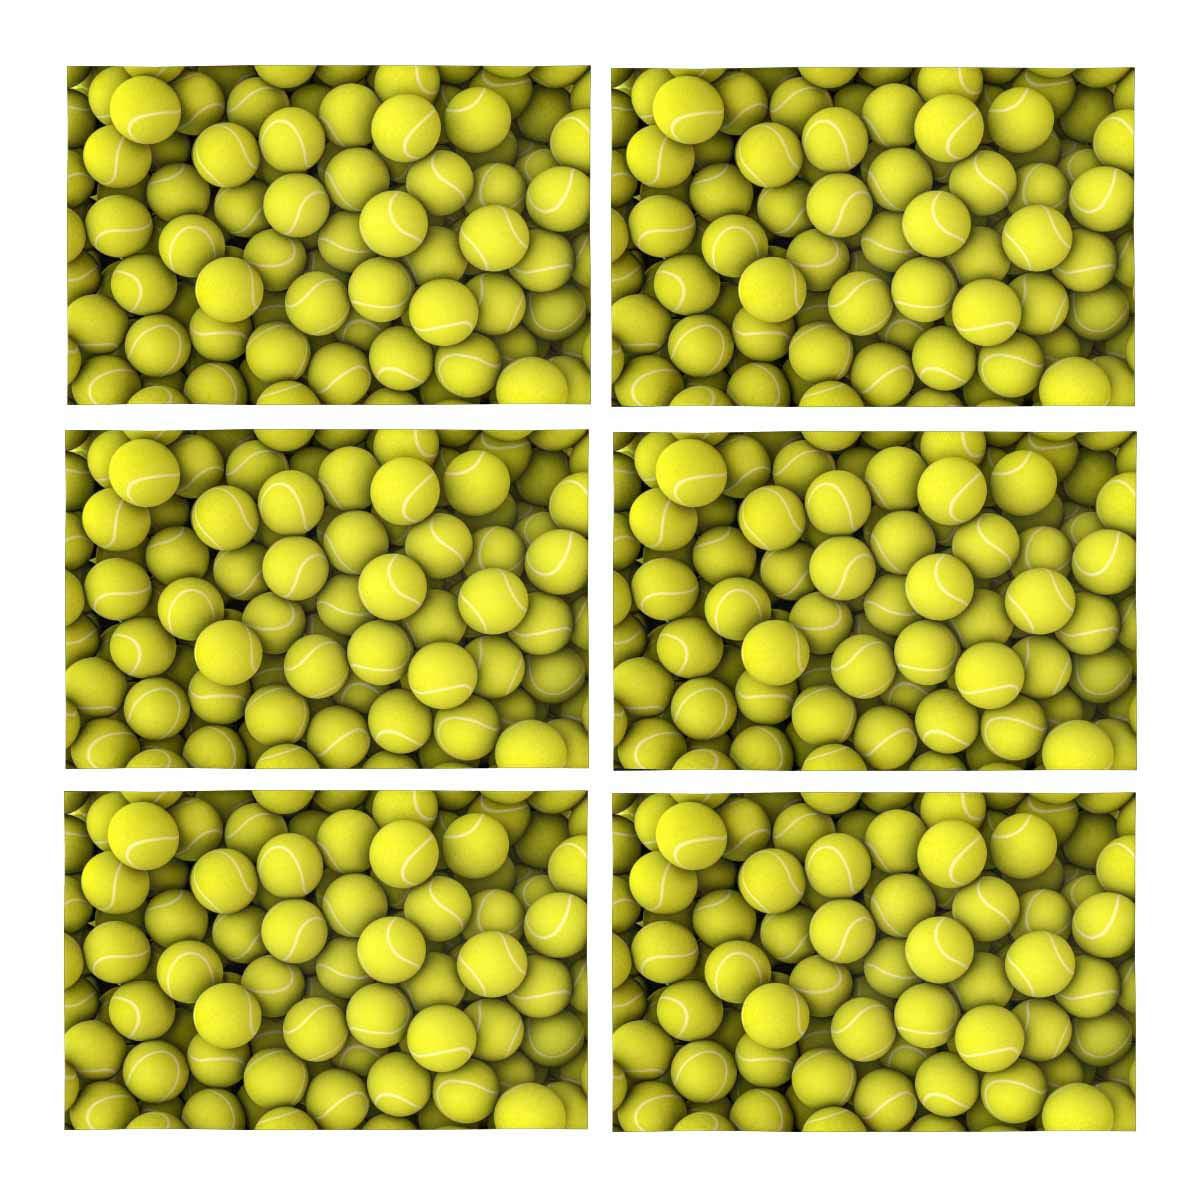 Mkhert Funny Sports Decor Tennis Balls Placemats Table